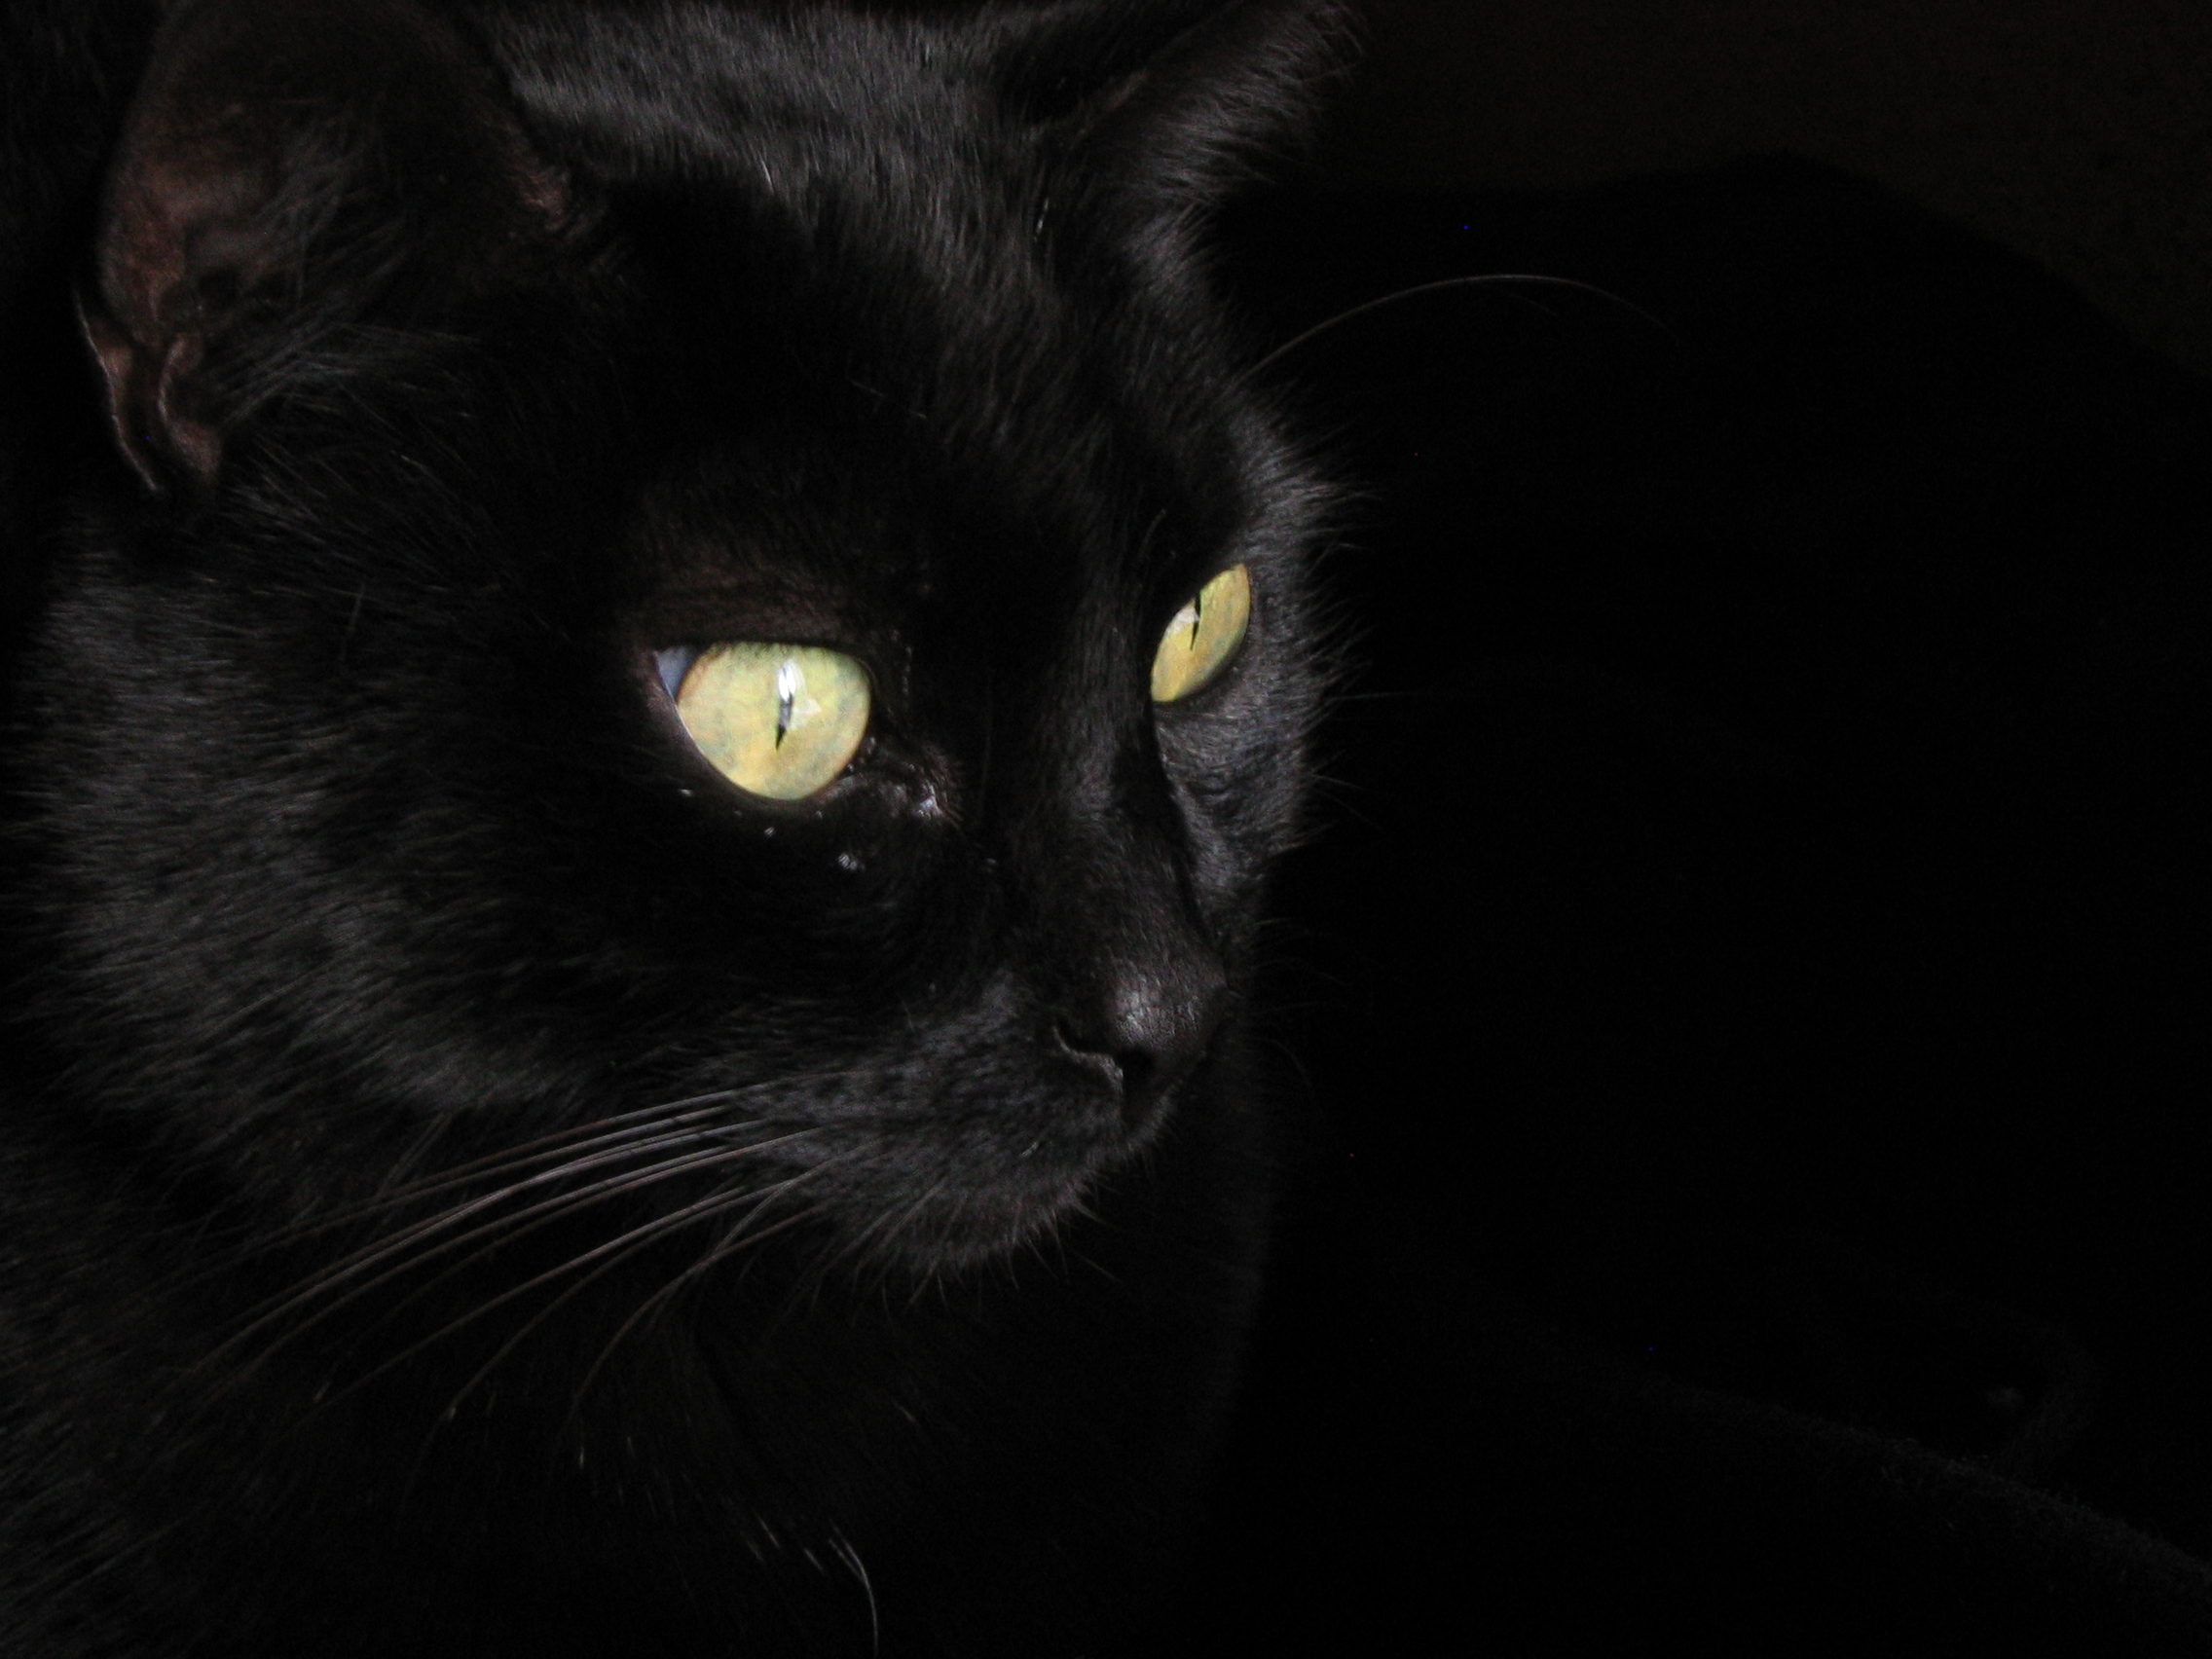 Картинки с черными кошками на аву, картинки про